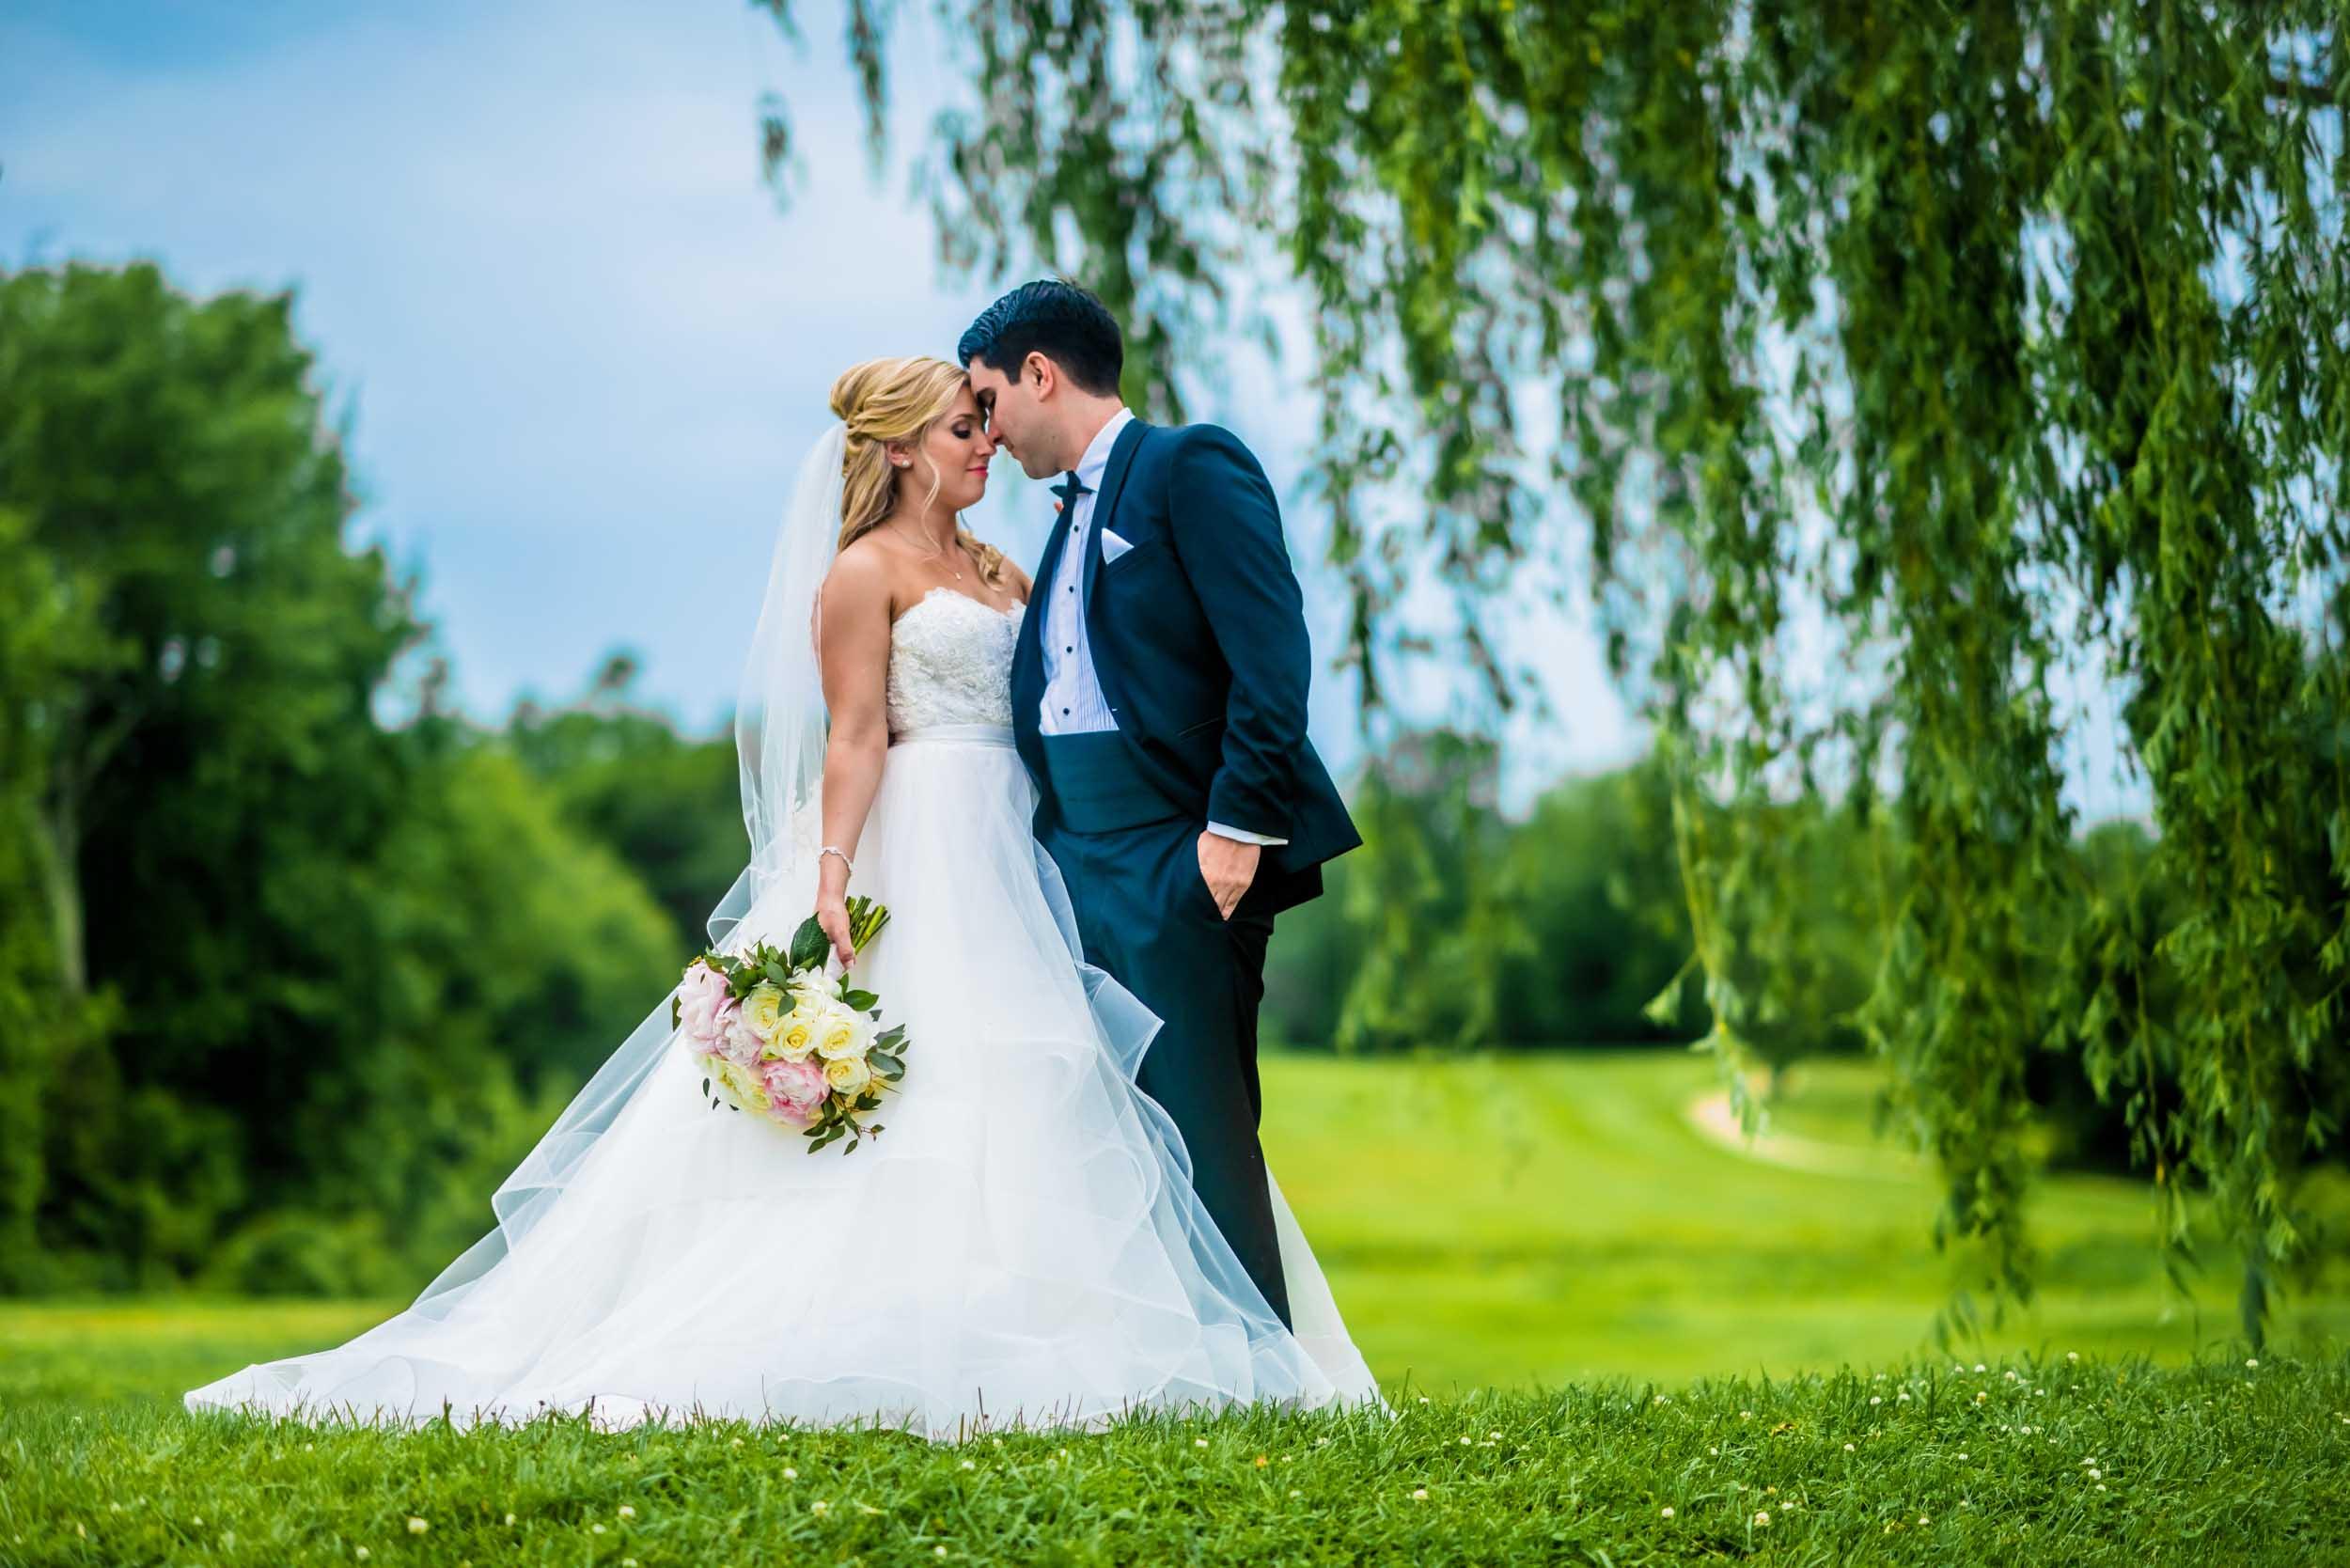 dc+metro+wedding+photographer+vadym+guliuk+photography+wedding+bride+and+groom-2069.jpg